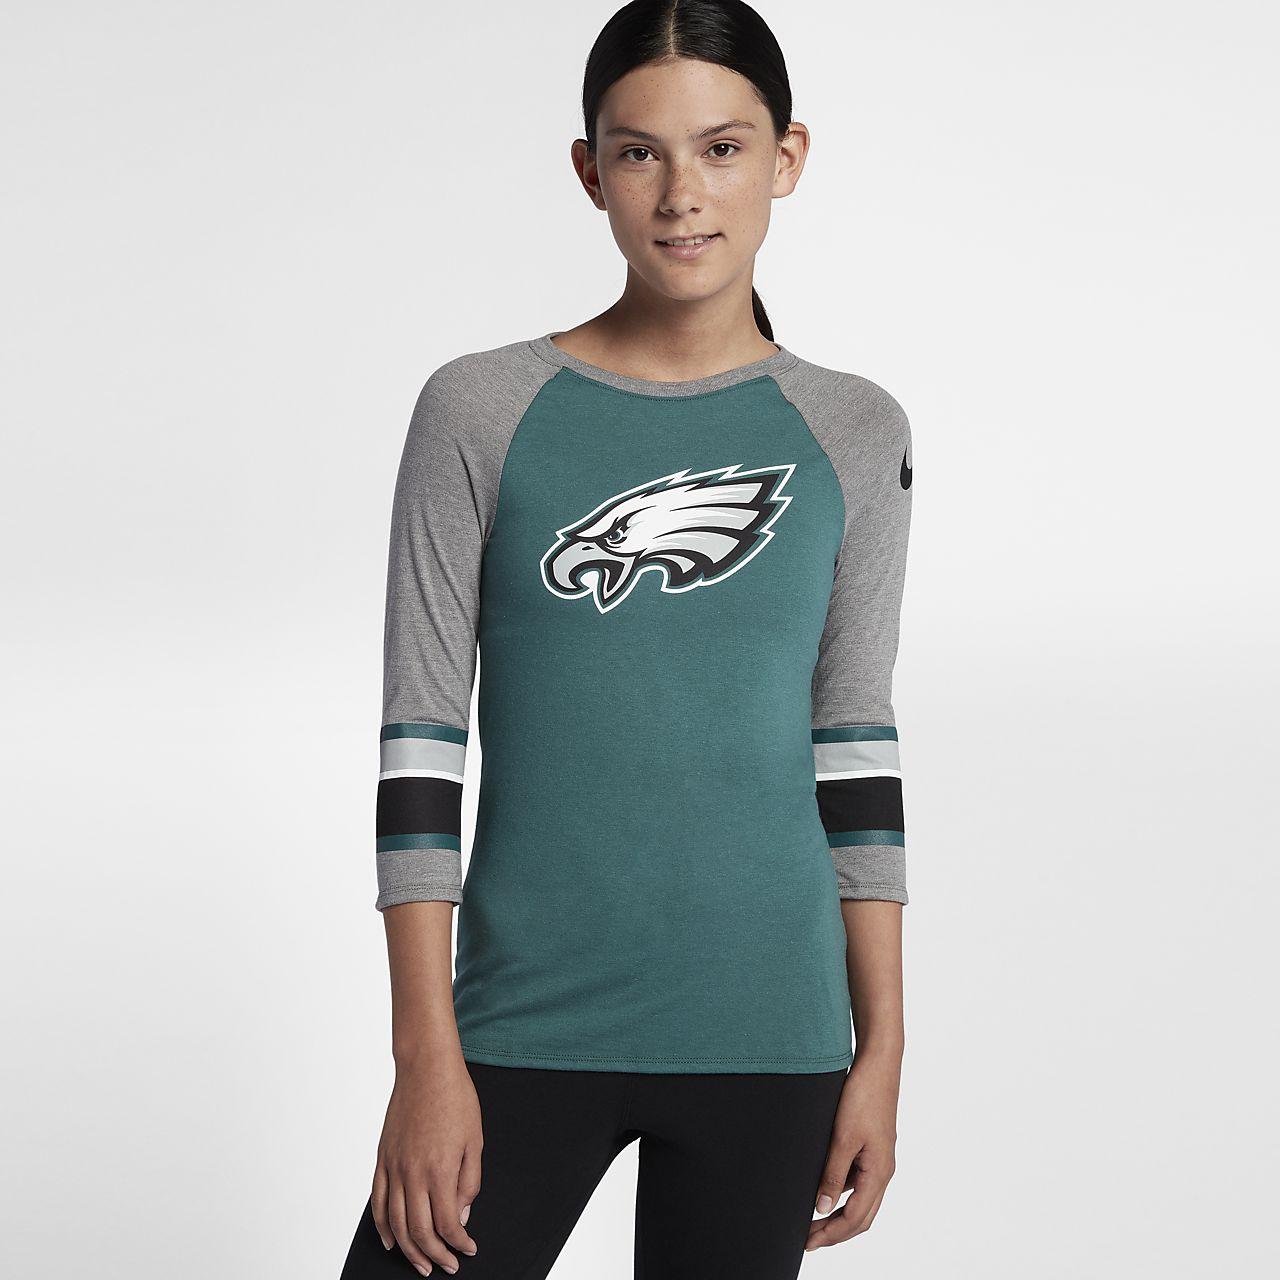 Nike raglan nfl eagles women 39 s t shirt for Eagles t shirt womens